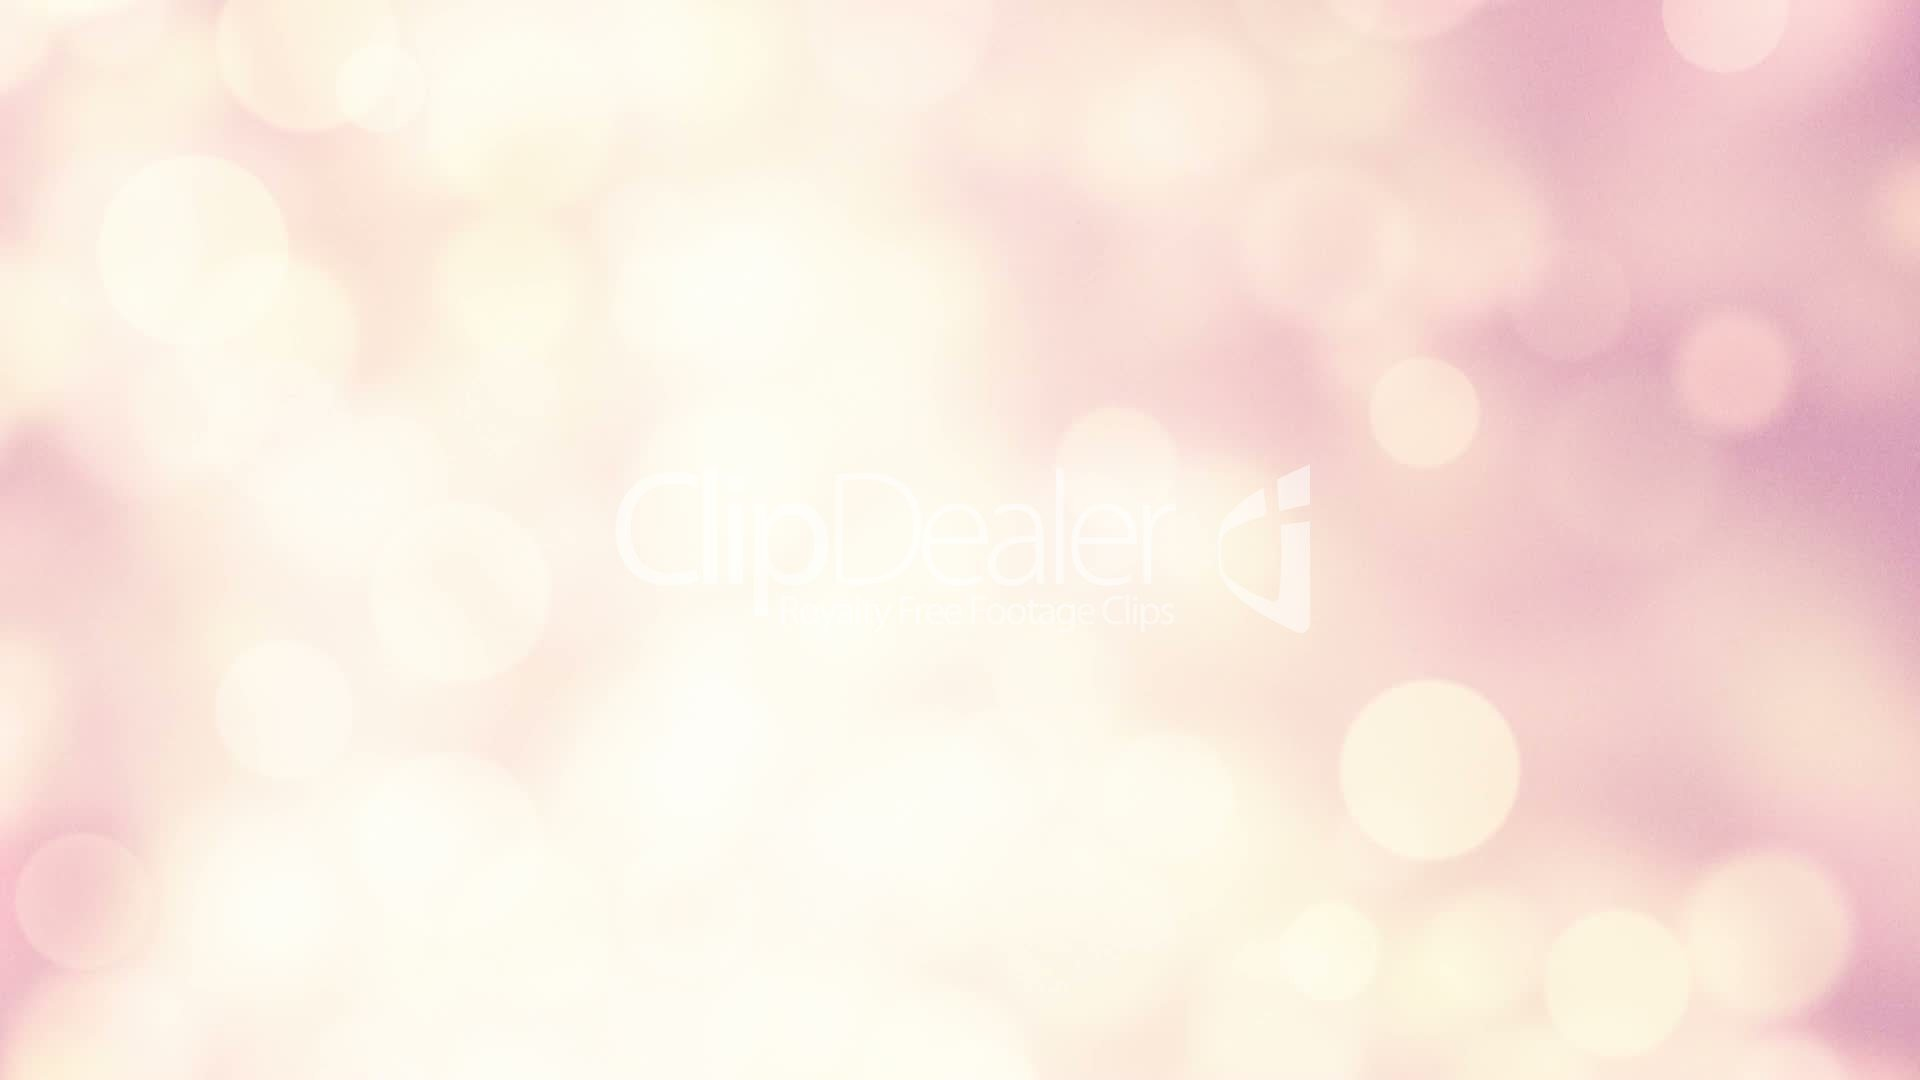 Soft Pink Wallpaper 39 Images